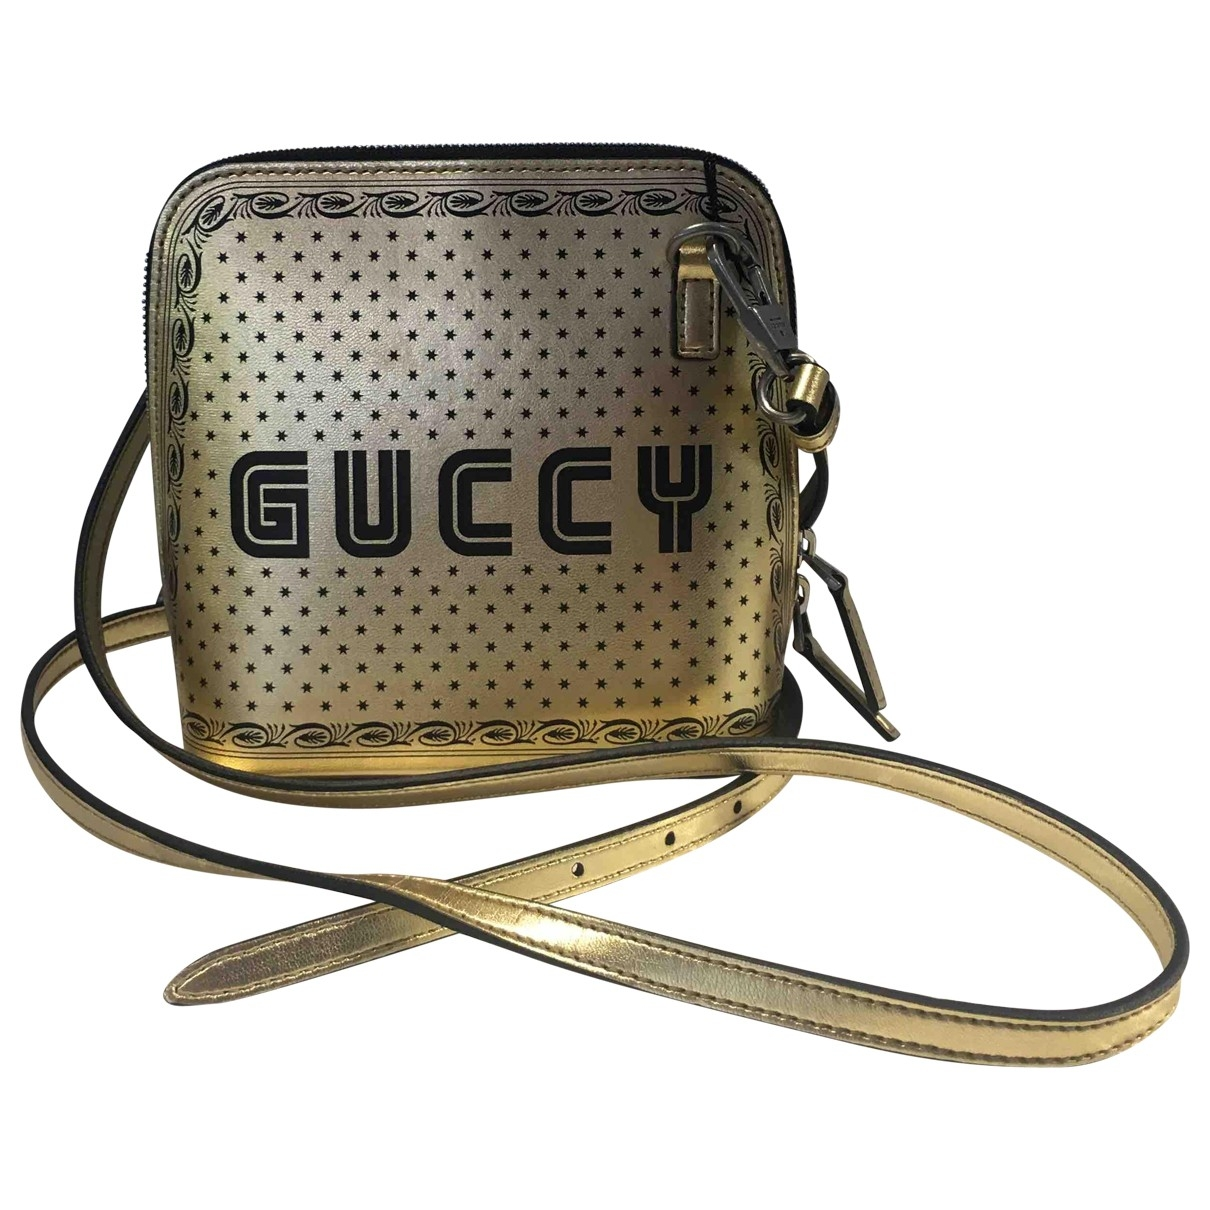 Gucci Guccy minibag Handtasche in  Gold Leder